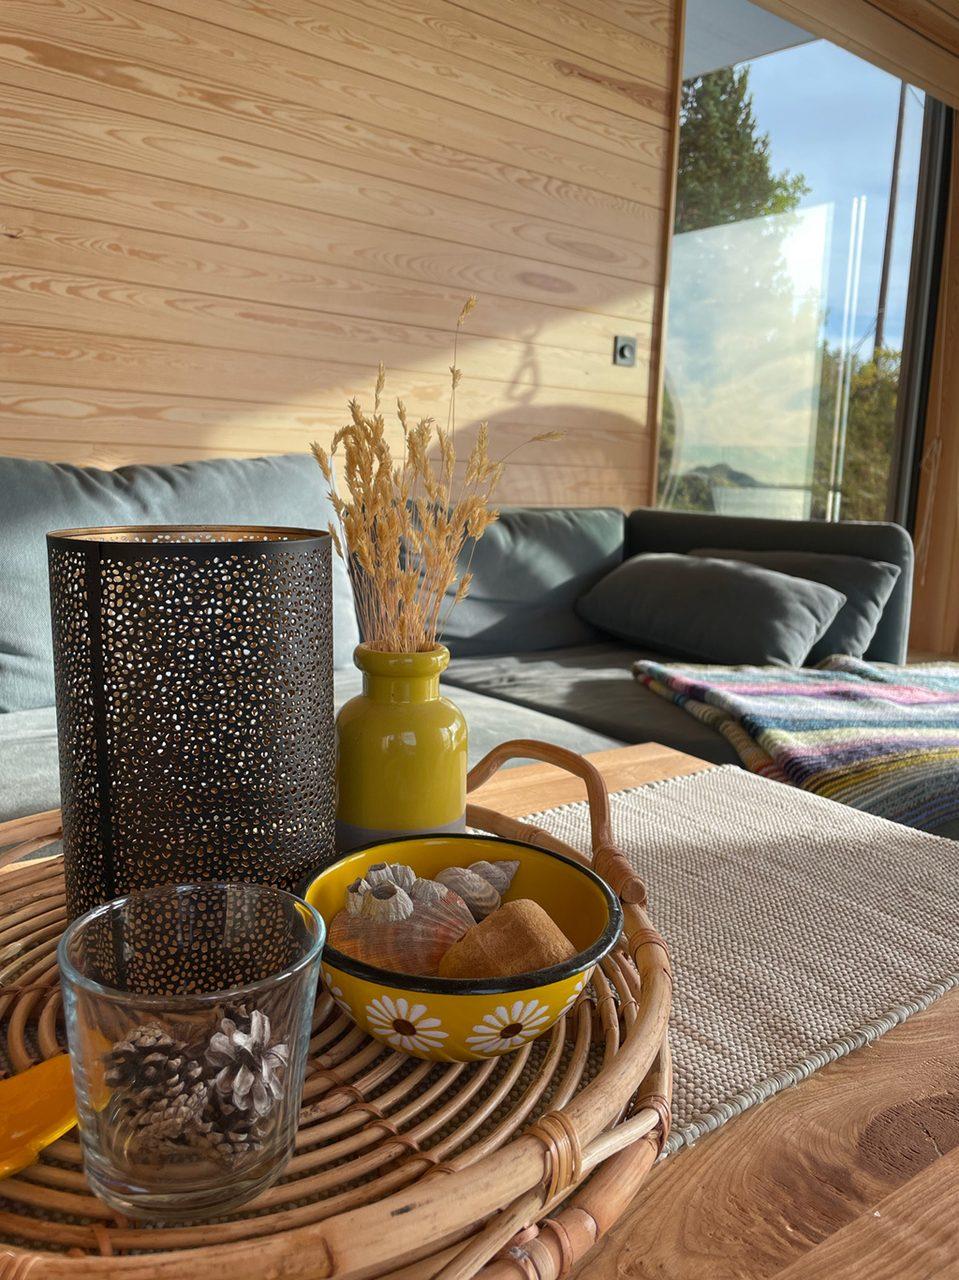 Interior design, Tableware, Textile, Wood, Vase, Comfort, Table, Serveware, Drinkware, Dishware